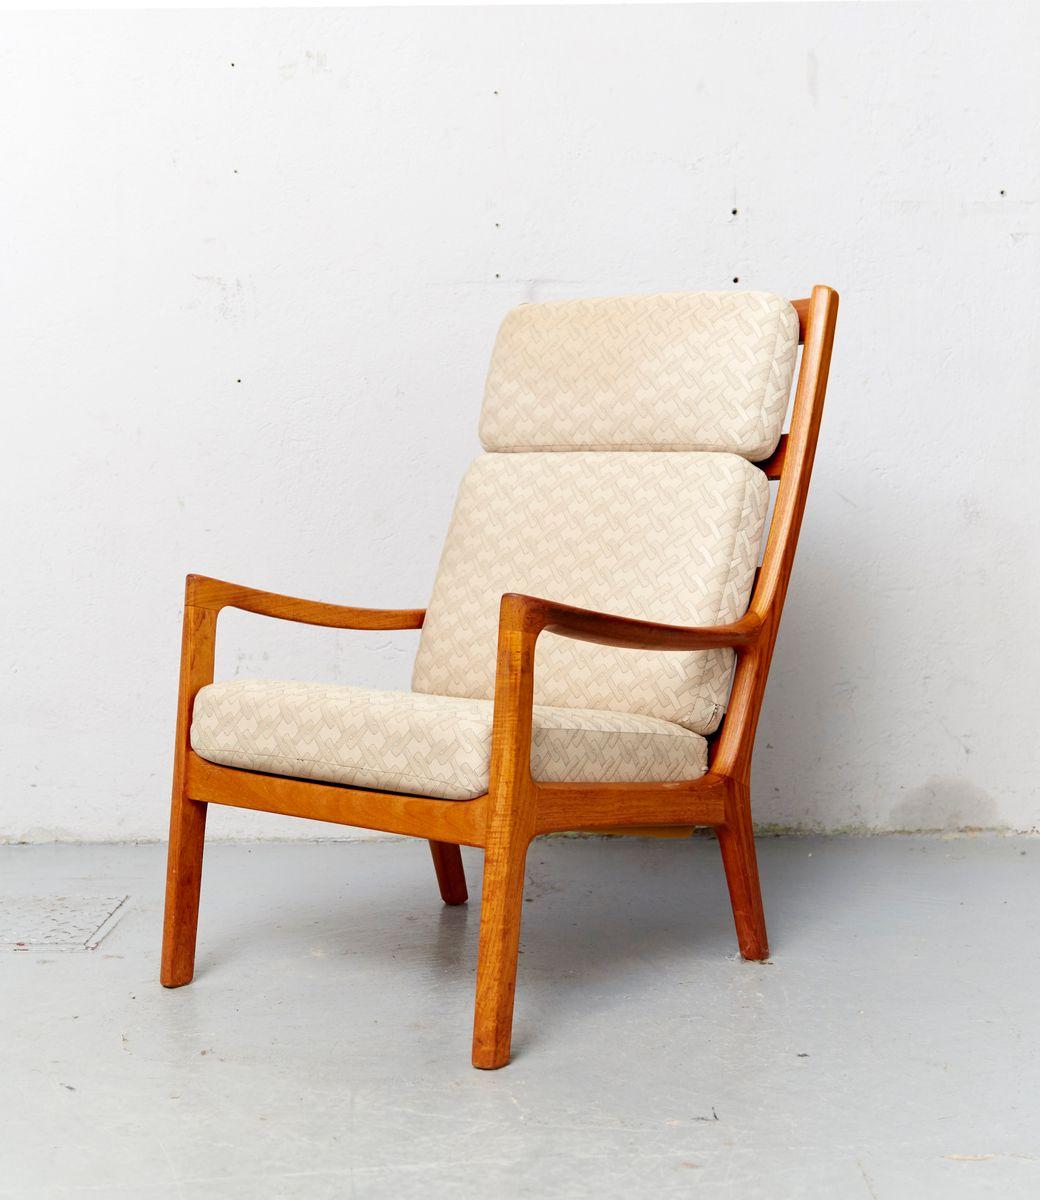 vintage senator sessel mit hoher r ckenlehne und fu hocker. Black Bedroom Furniture Sets. Home Design Ideas